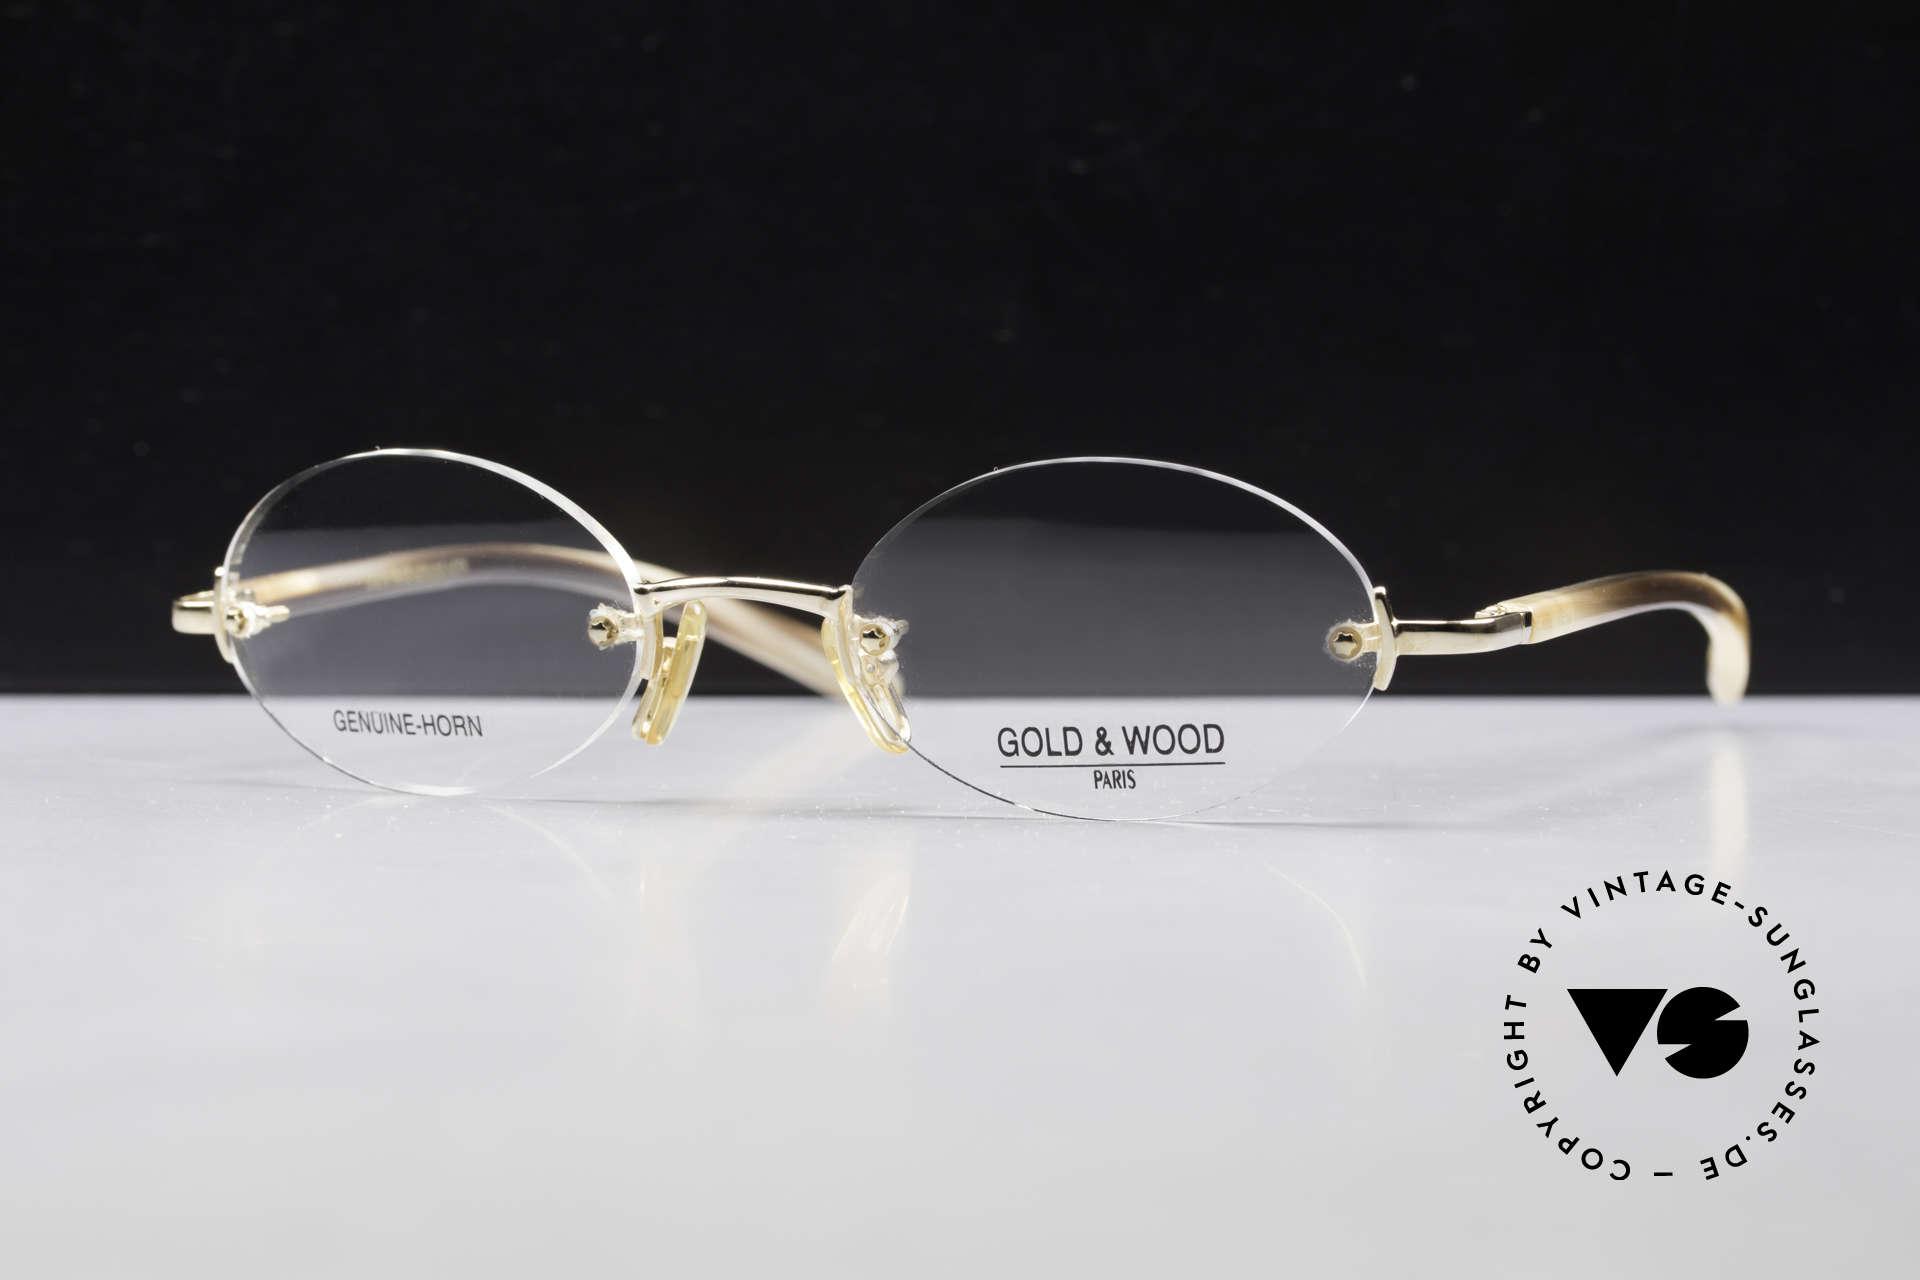 Gold & Wood 331 Rimless Genuine Horn Glasses, the credo: elegance, timelessness, craftsmanship, Made for Men and Women